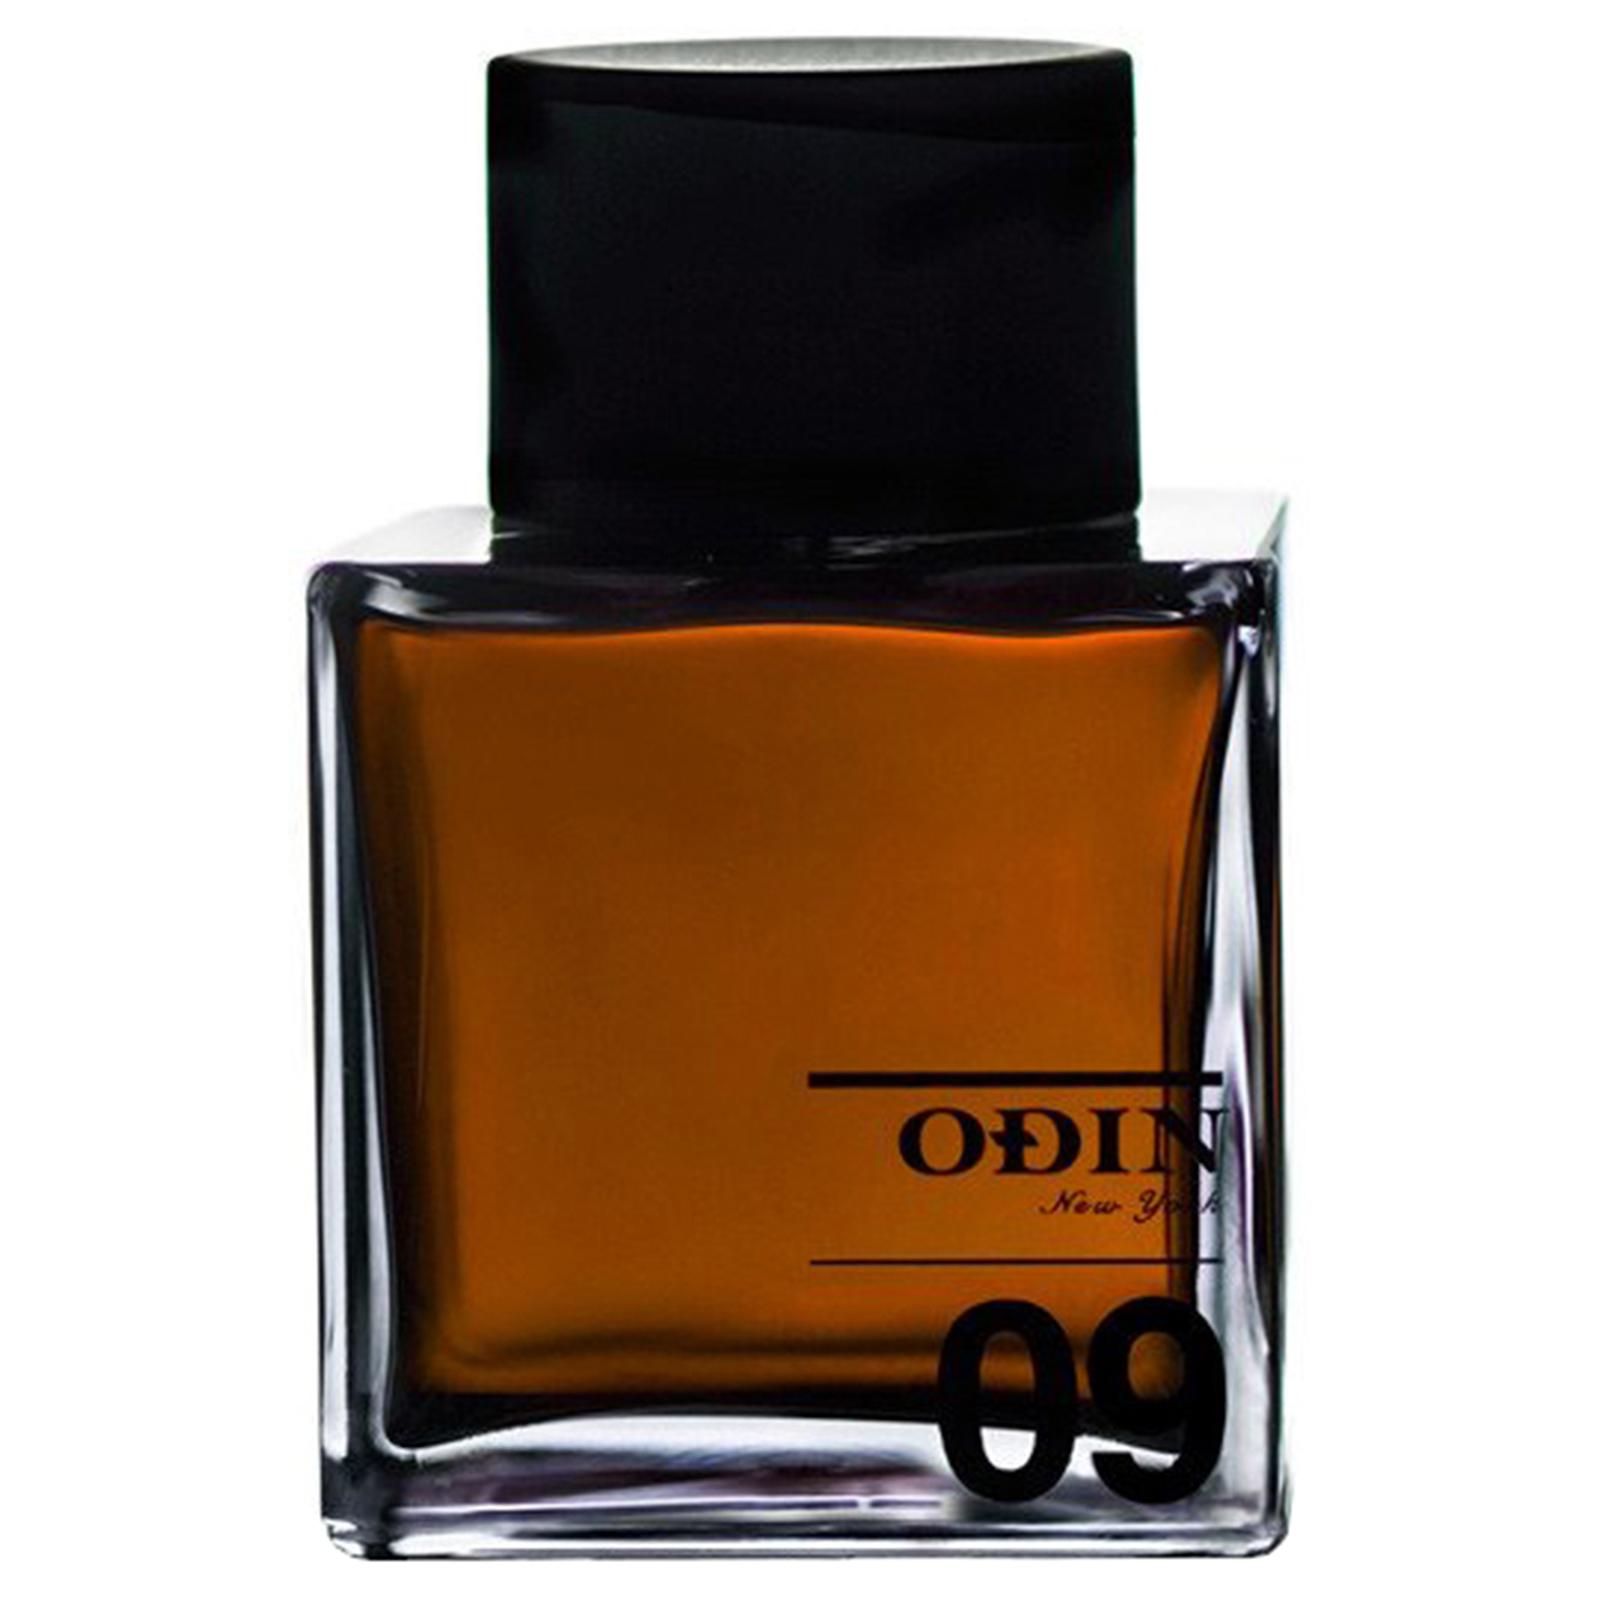 09 posala profumo eau de parfum 100 ml